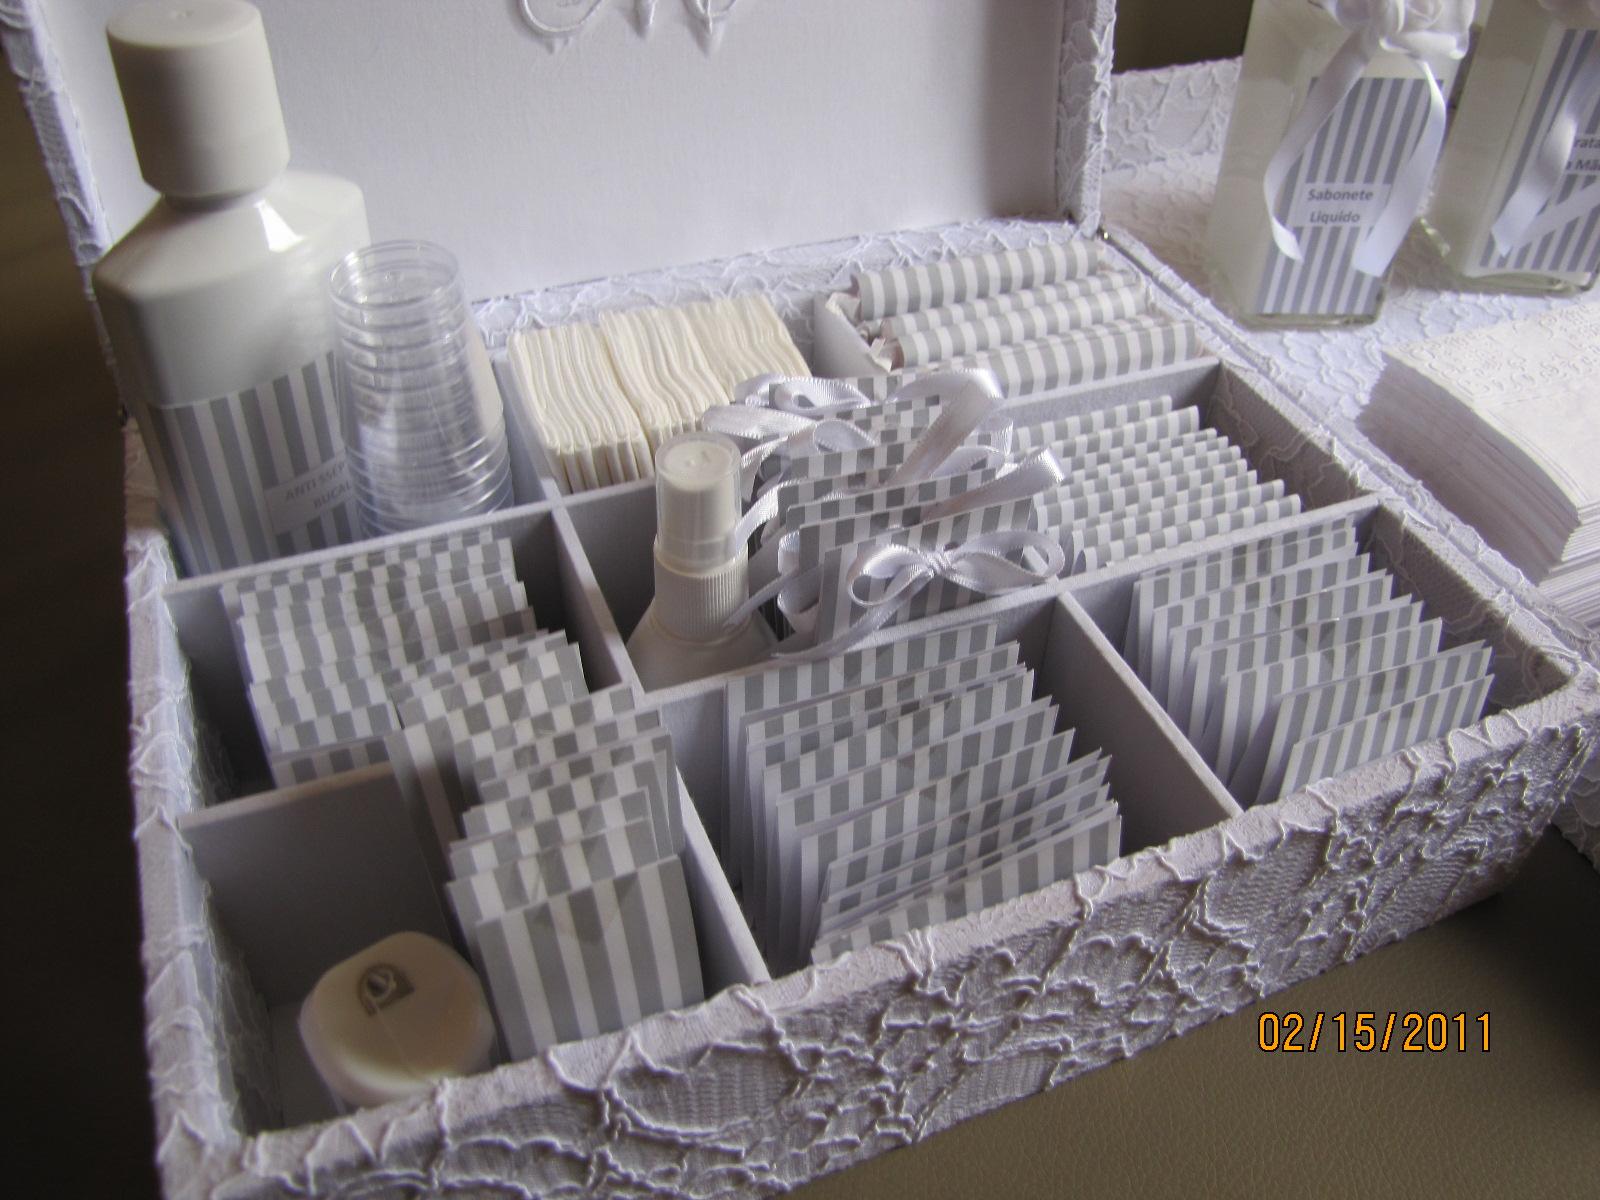 kit banheiro feminino e masculino kit kit banheiro feminino e #6A5C45 1600 1200